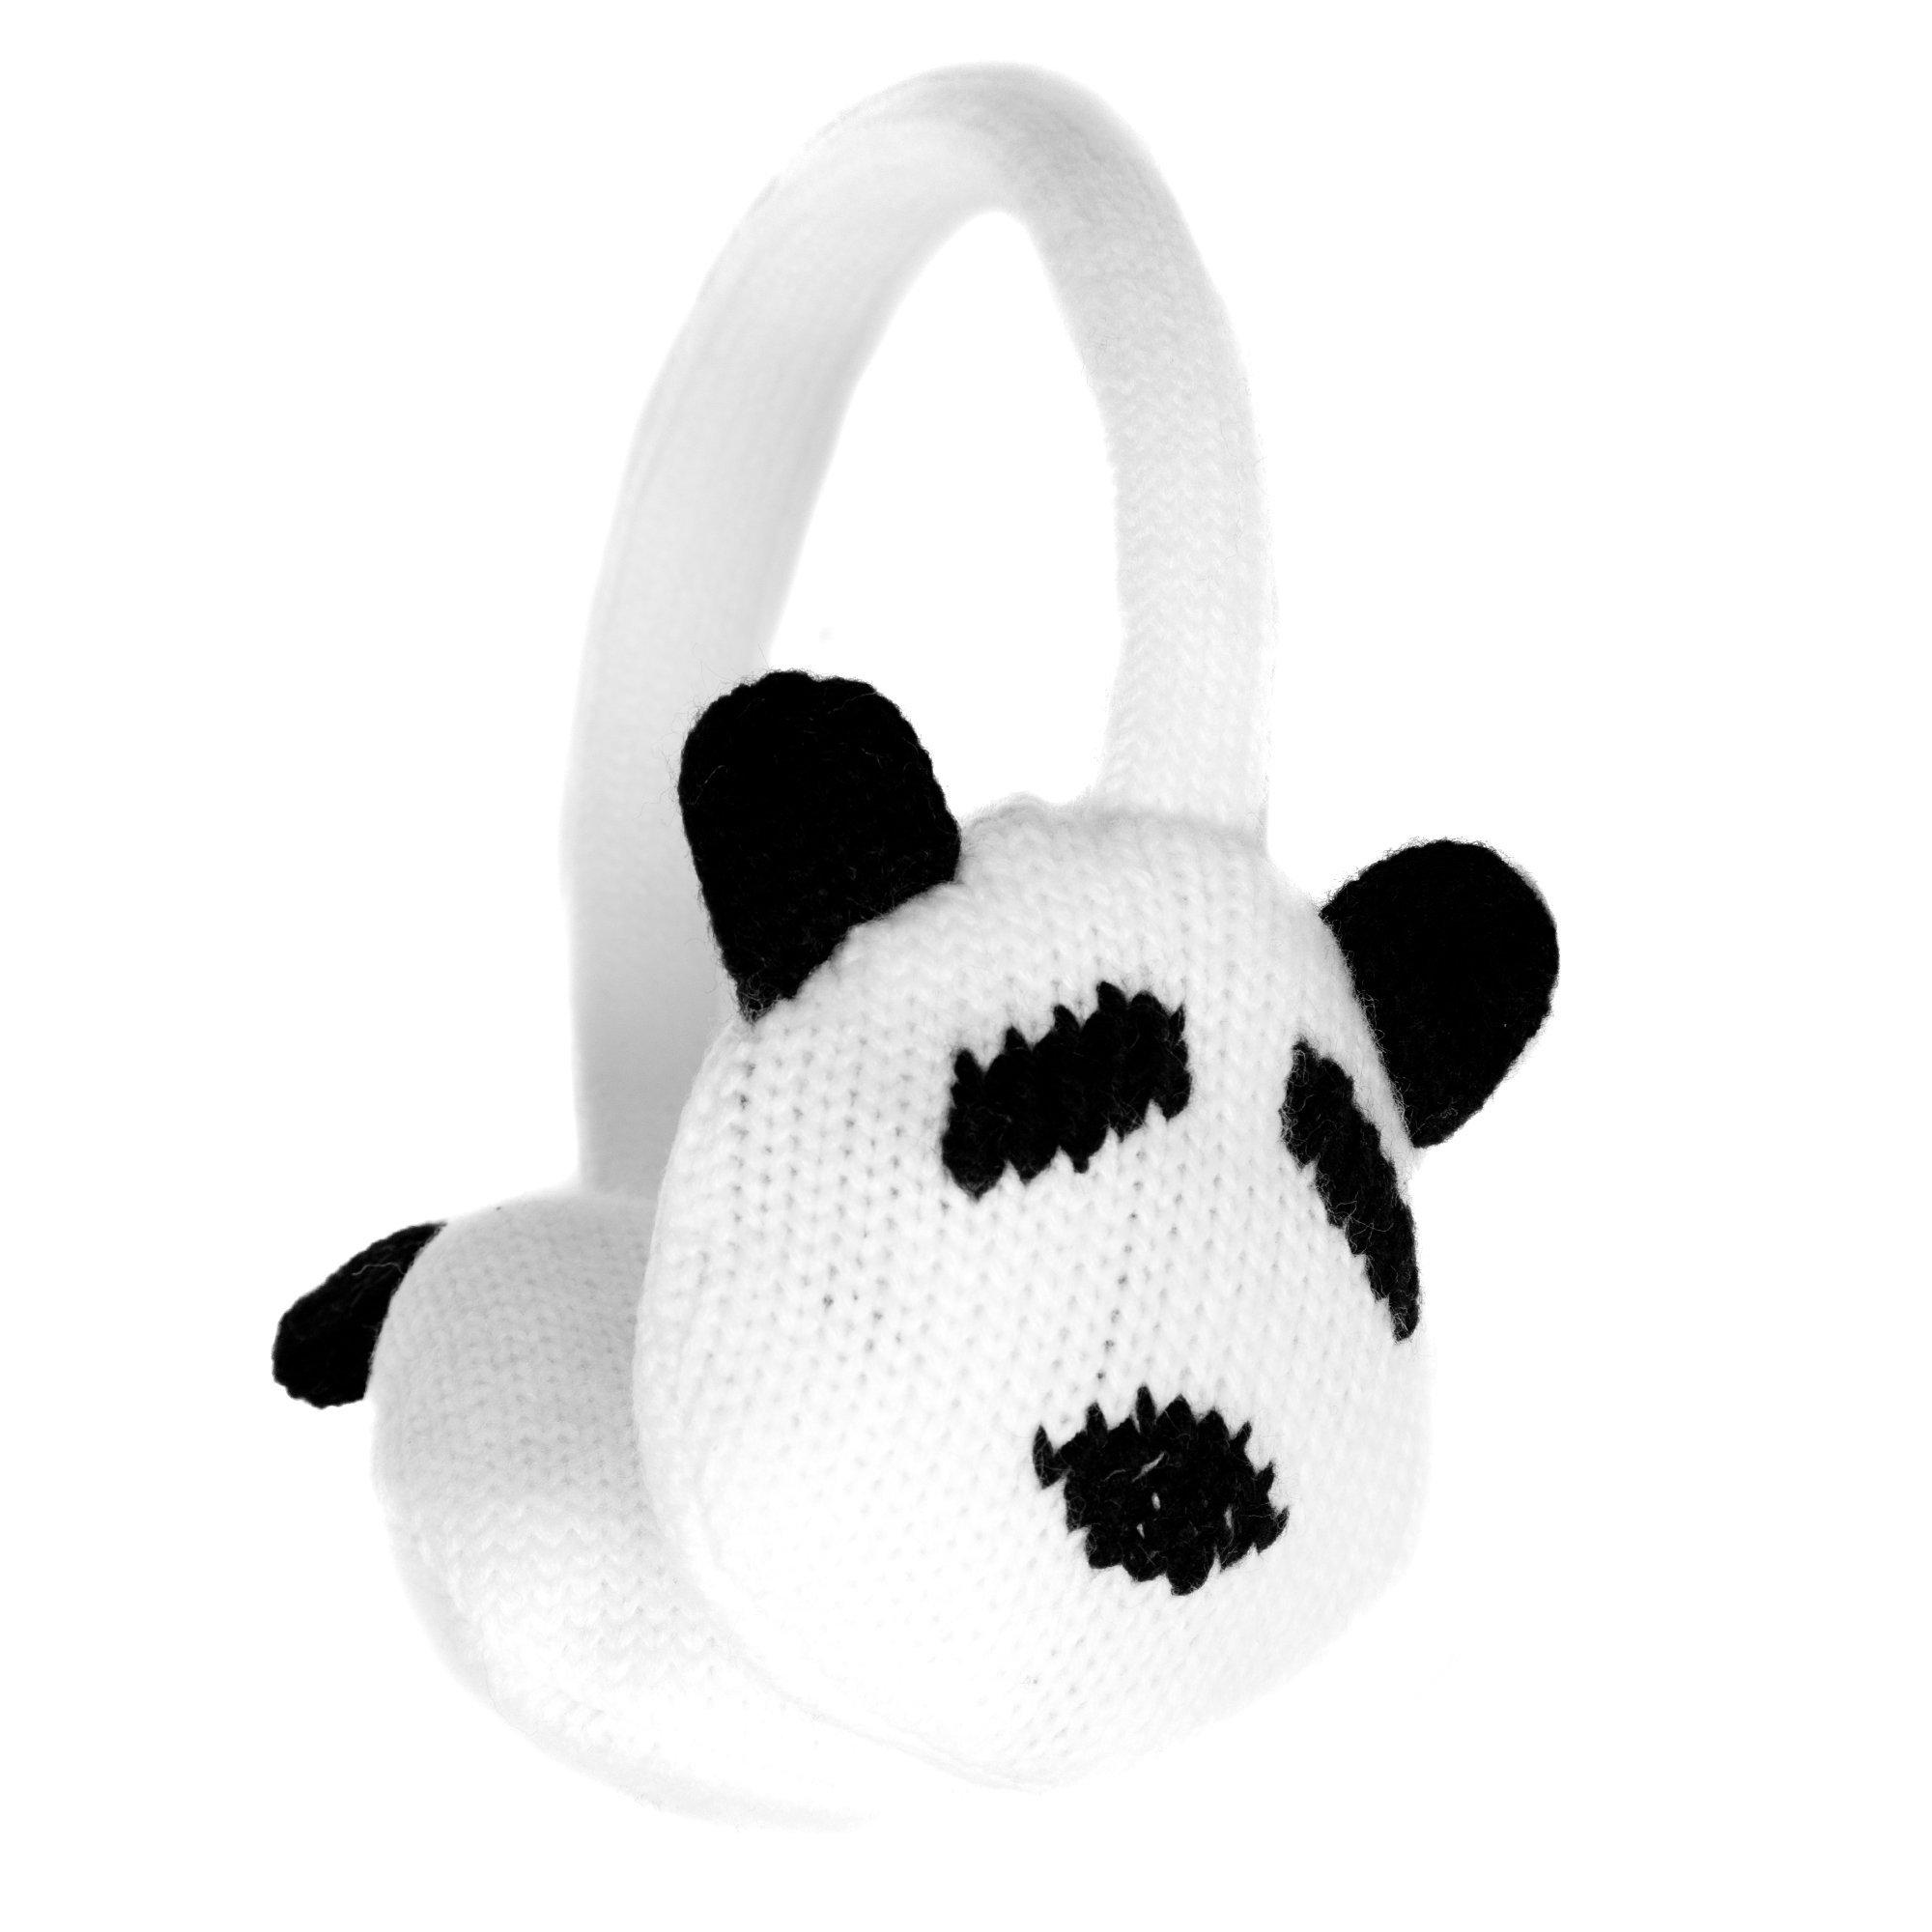 Accessoryo Women's Cute Panda Style Winter Thermal Fashion Earmuffs One Size Black and White